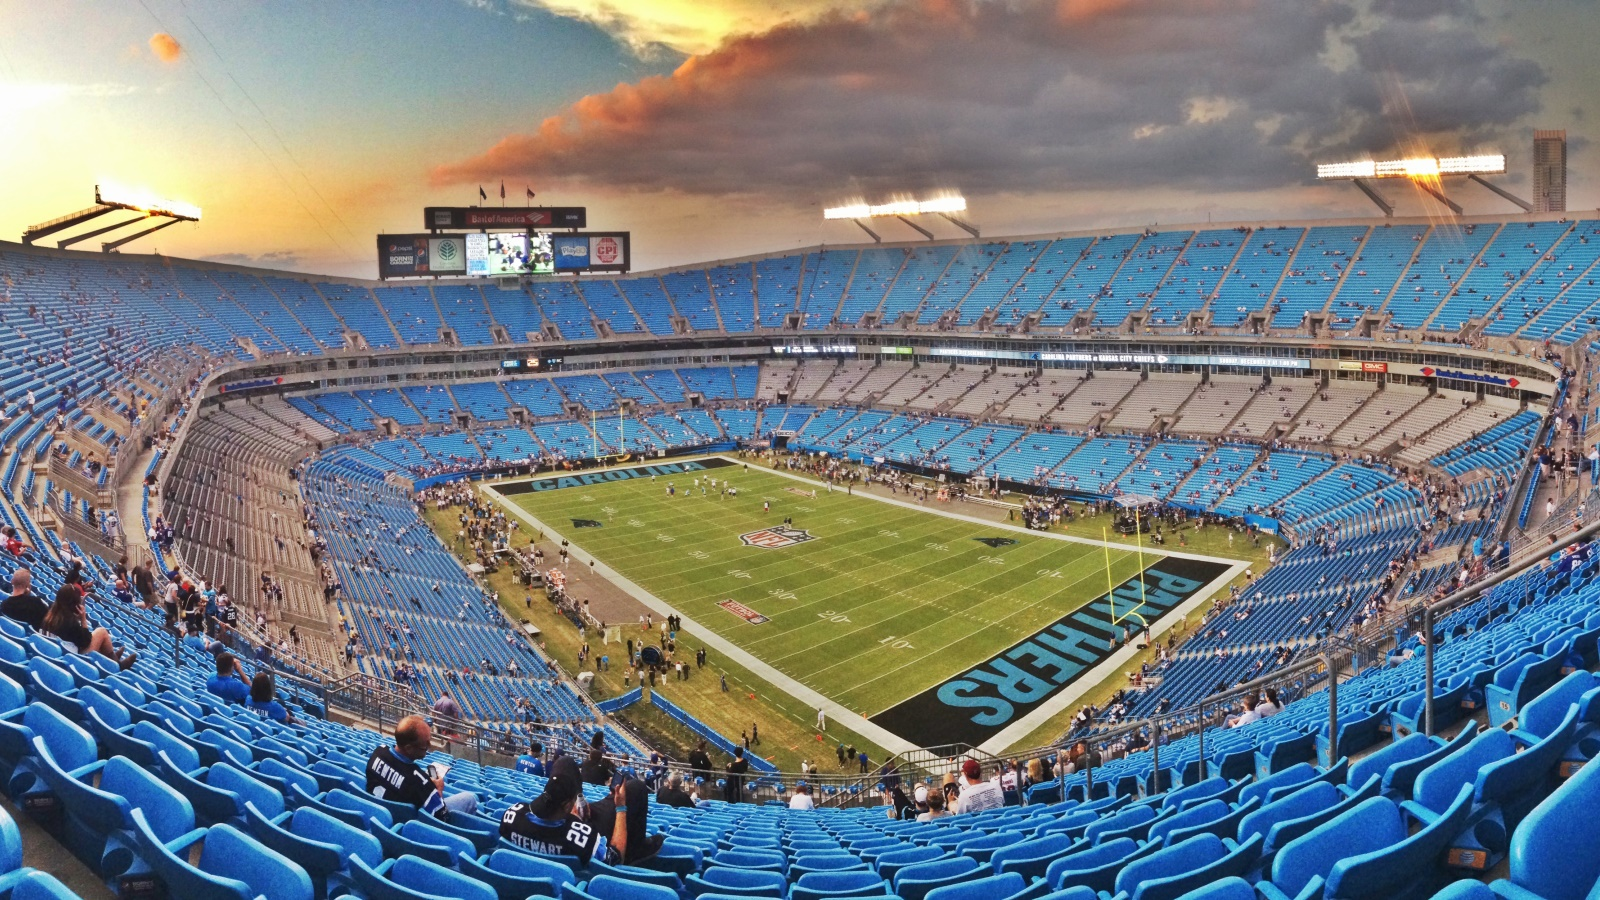 Bank of America Stadium Charlotte Sports 1600x900